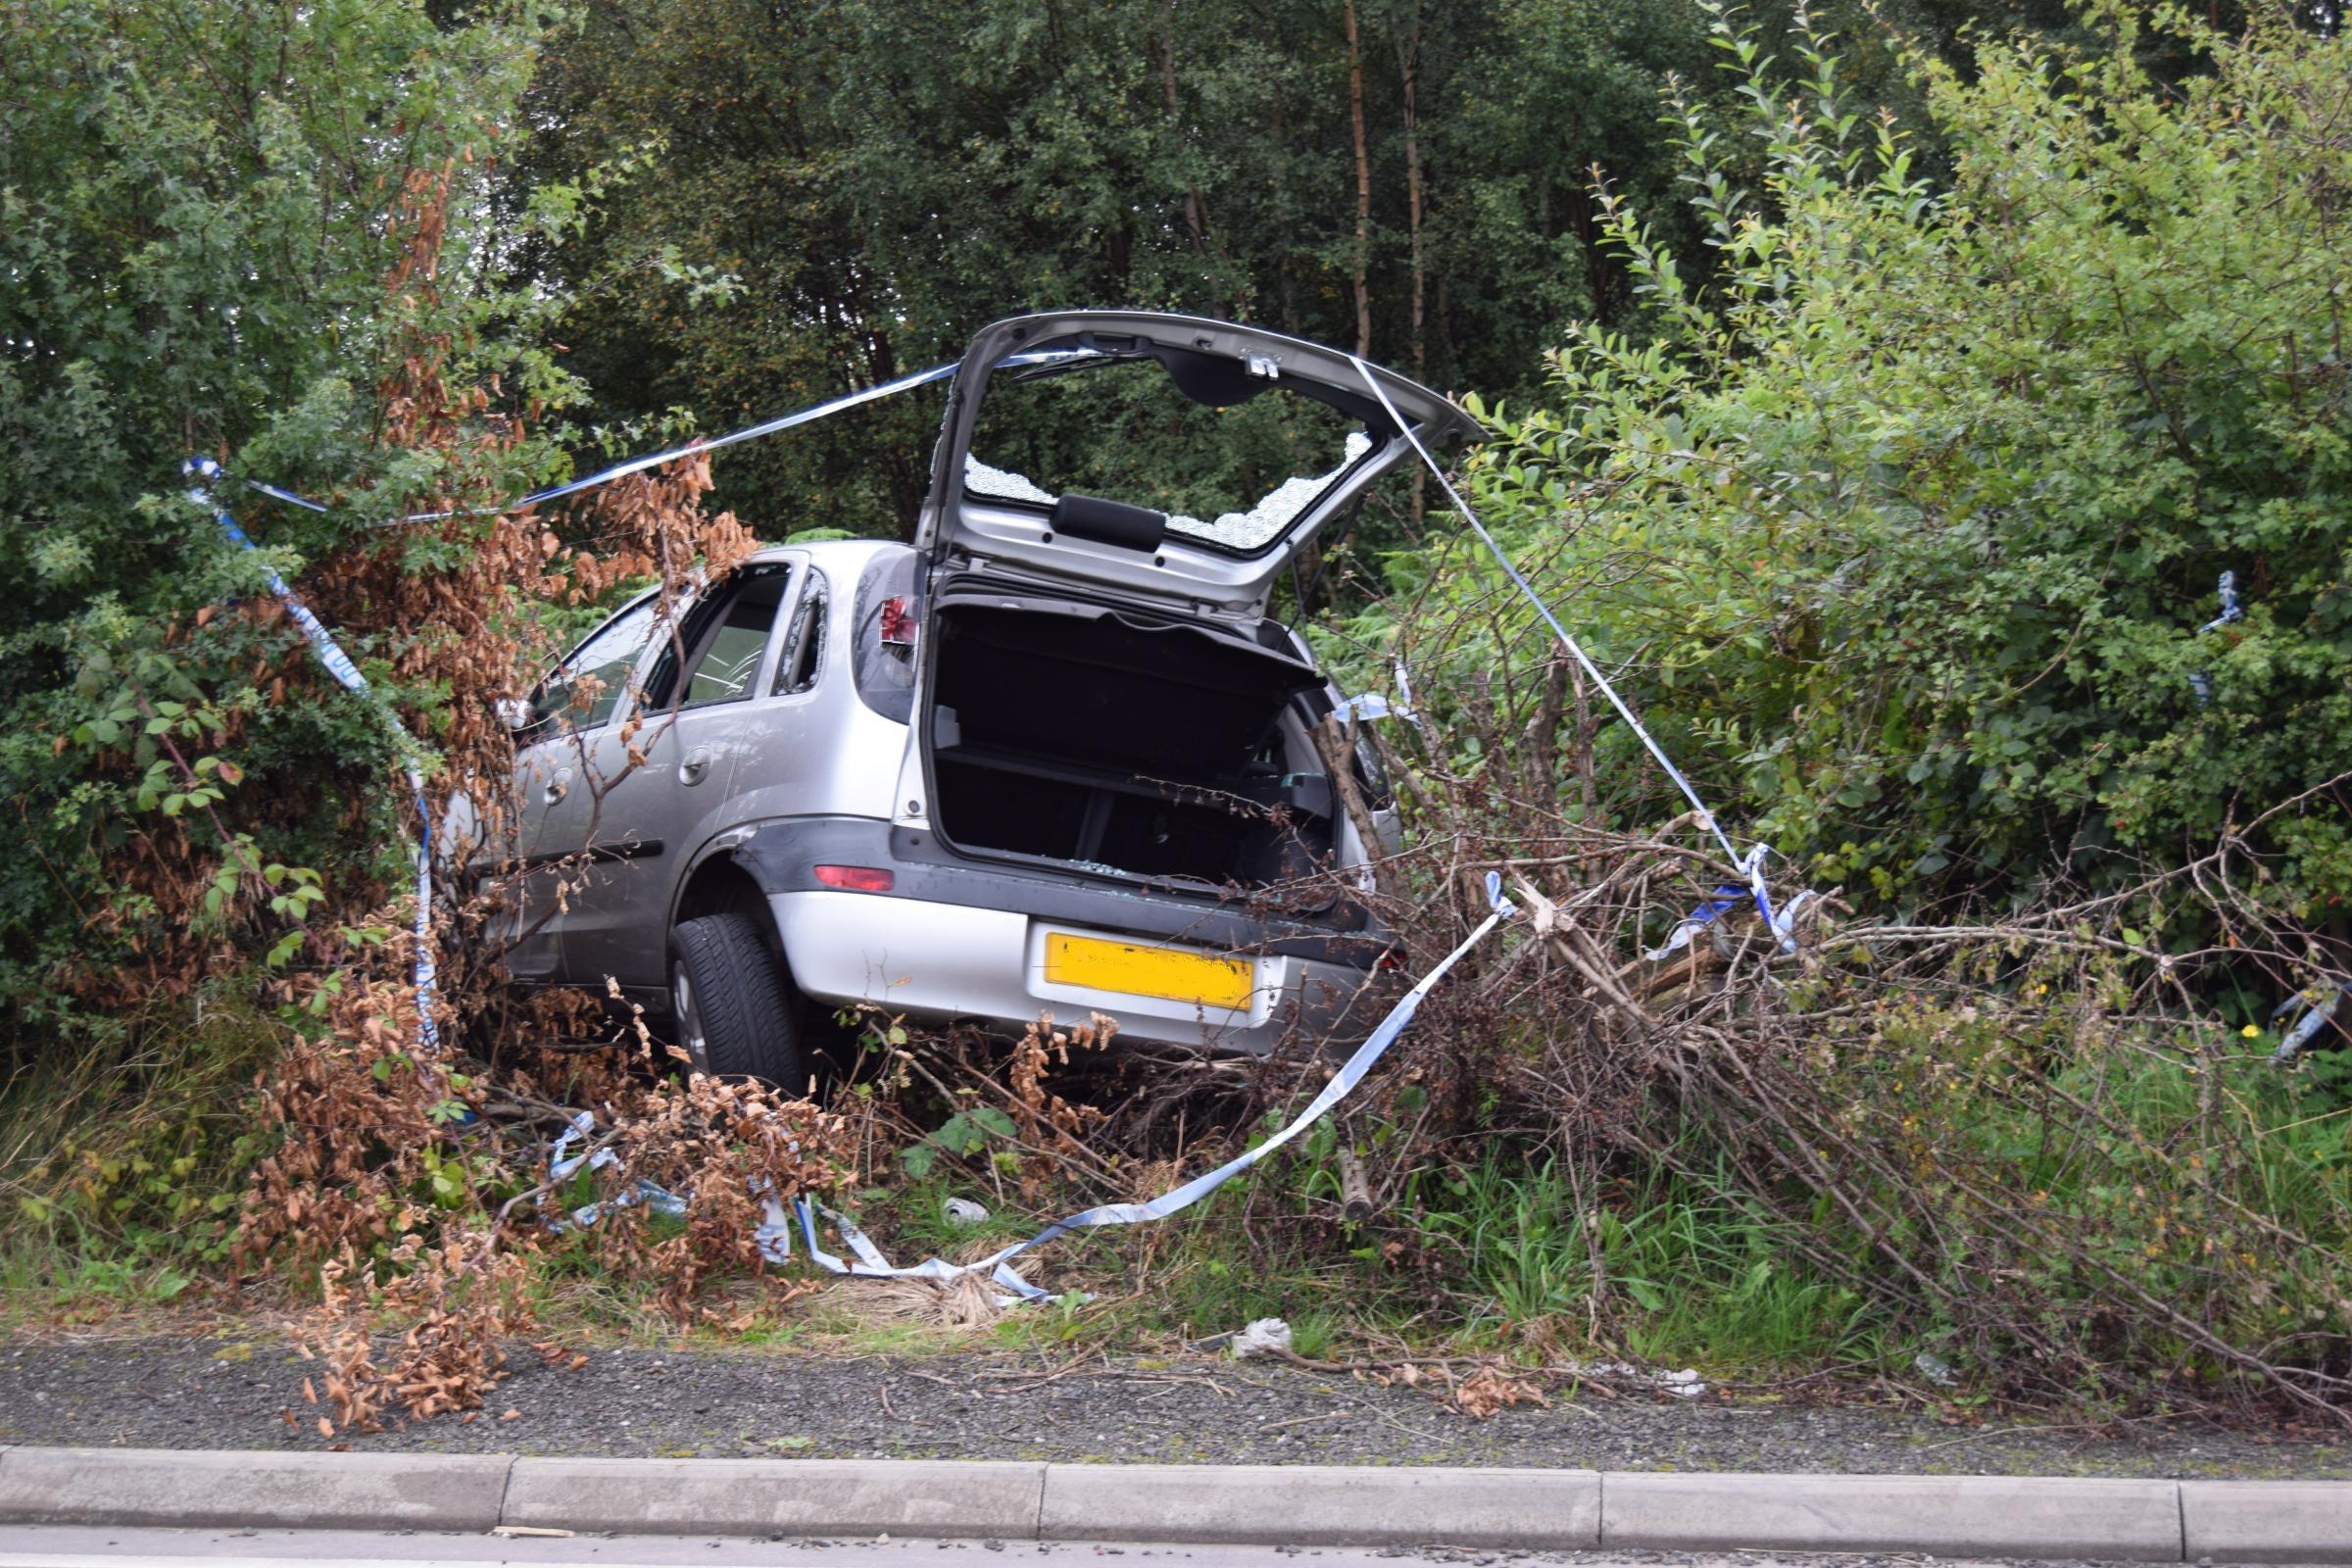 Revealed Number Of Abandoned Cars Across West Dorset Doubles Dorset Echo